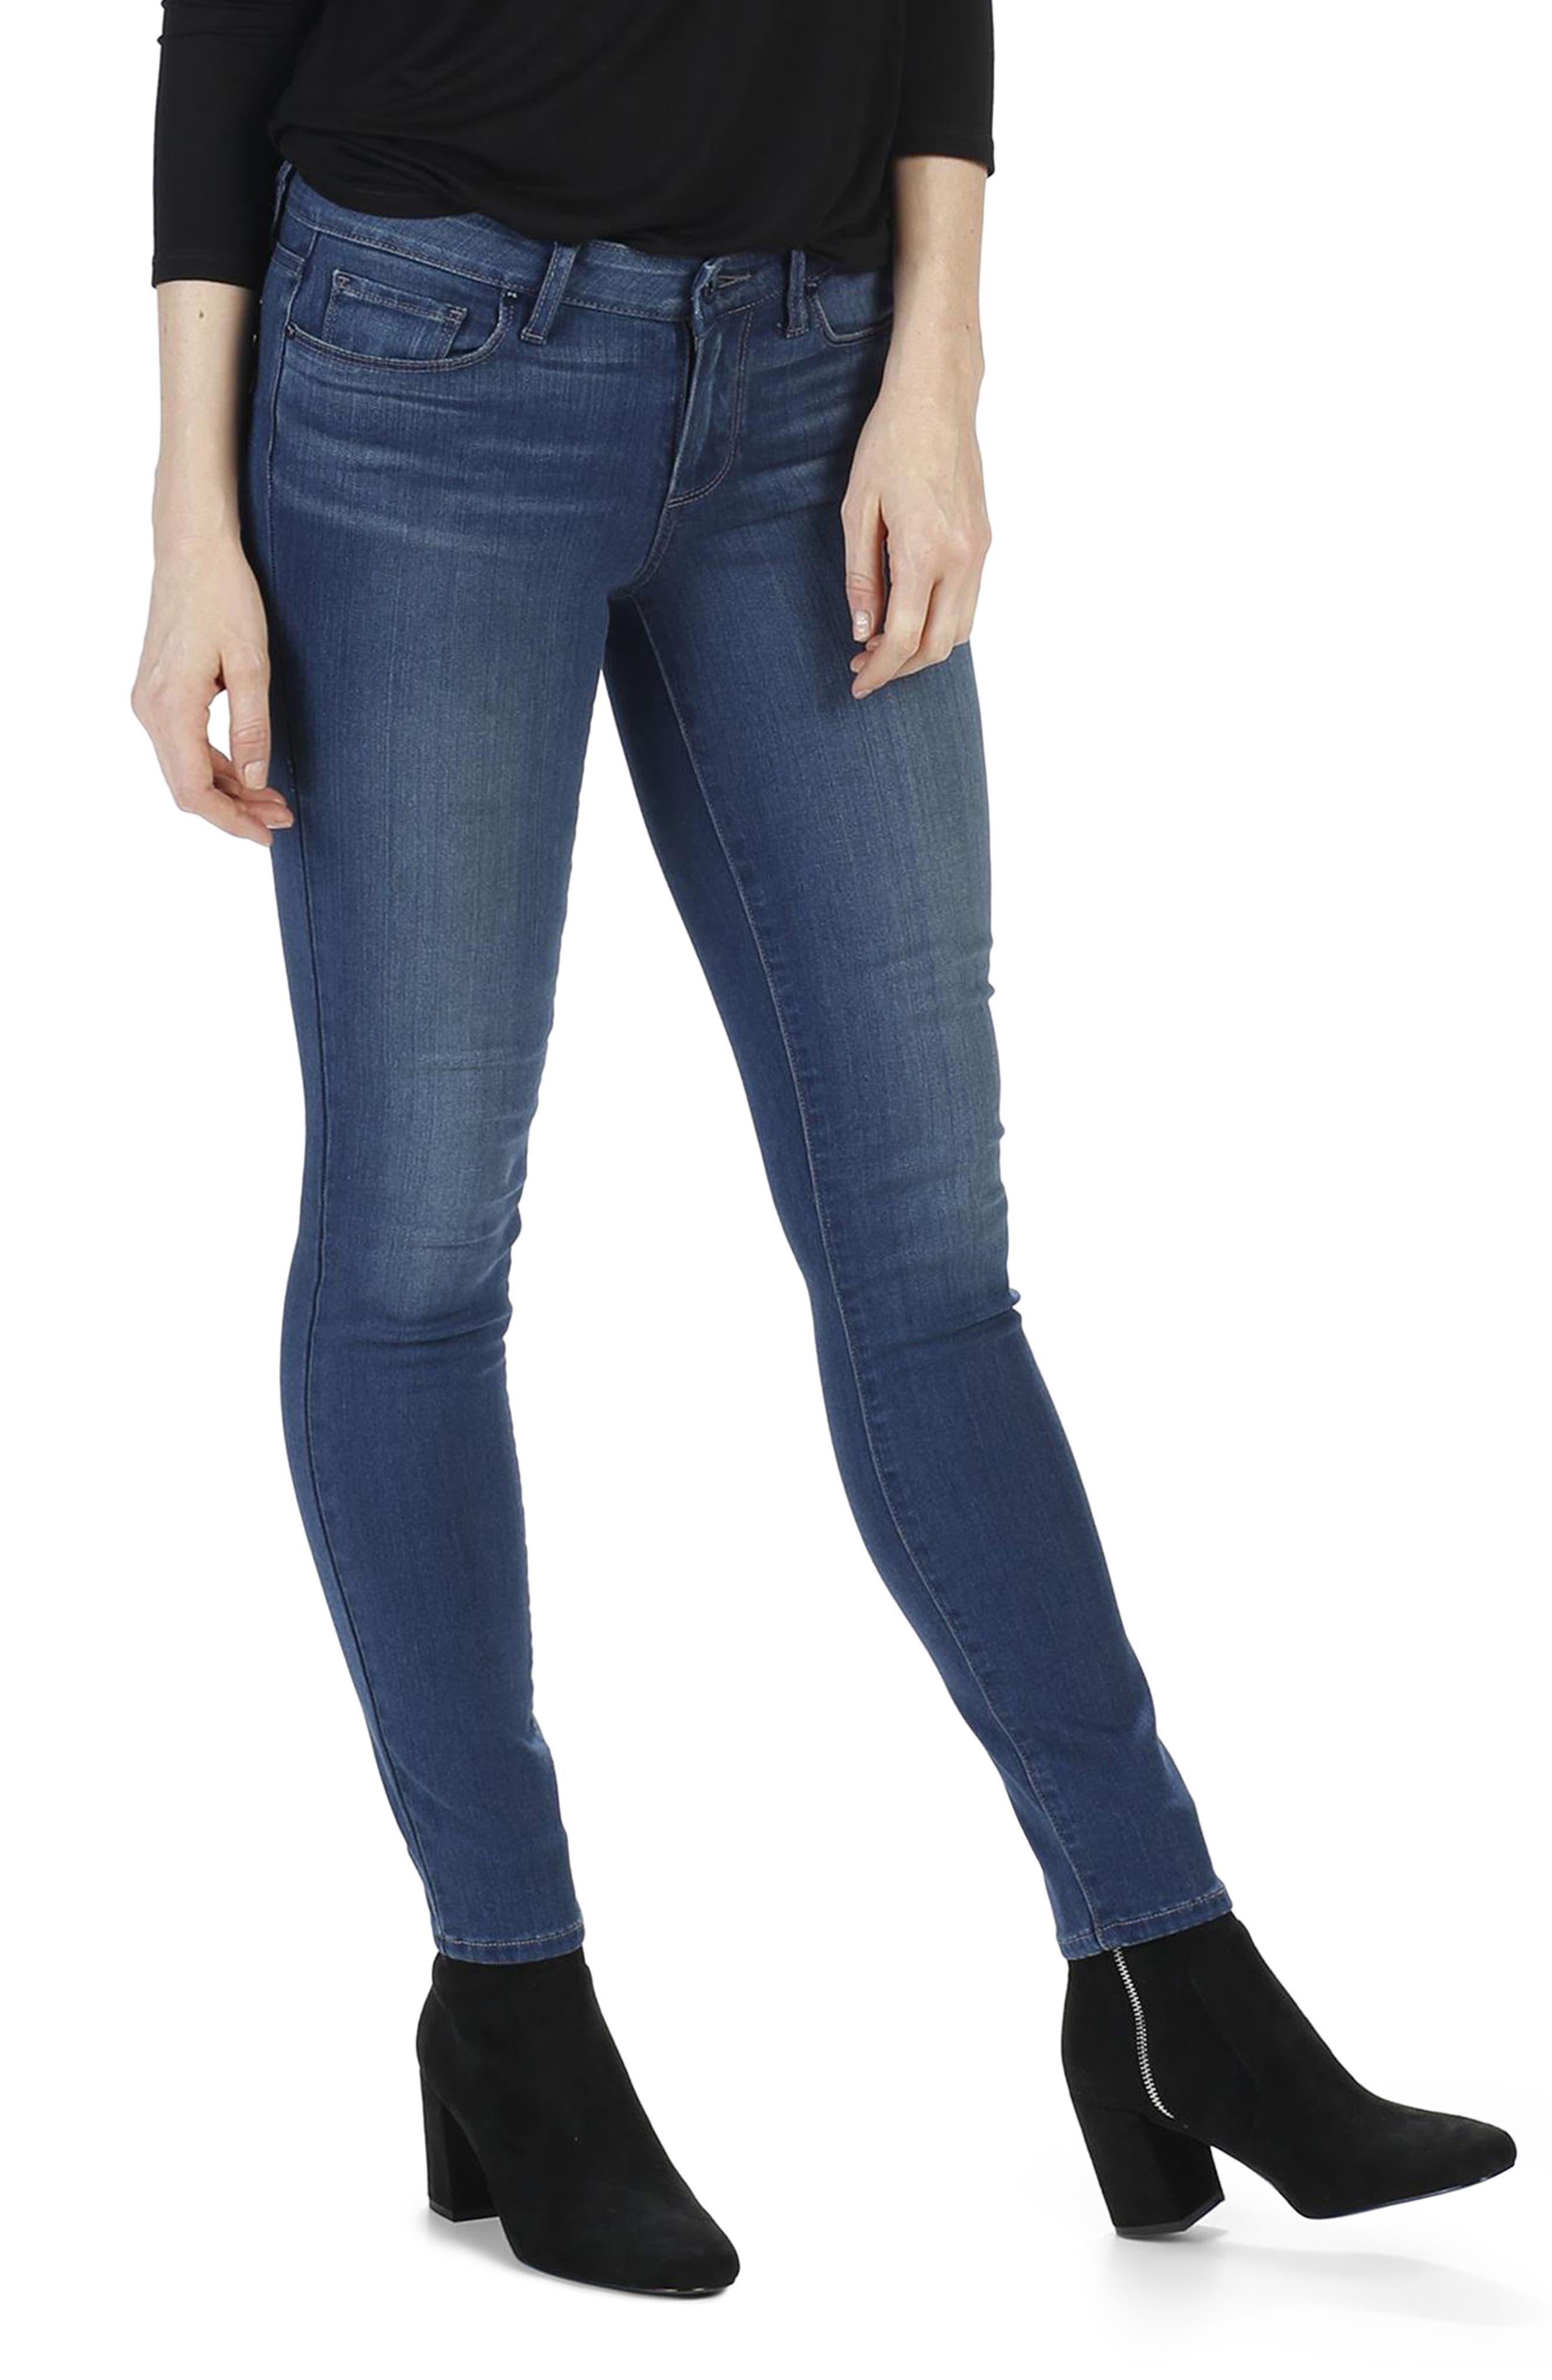 Transcend - Verdugo Ultra Skinny Jeans,                         Main,                         color, 400